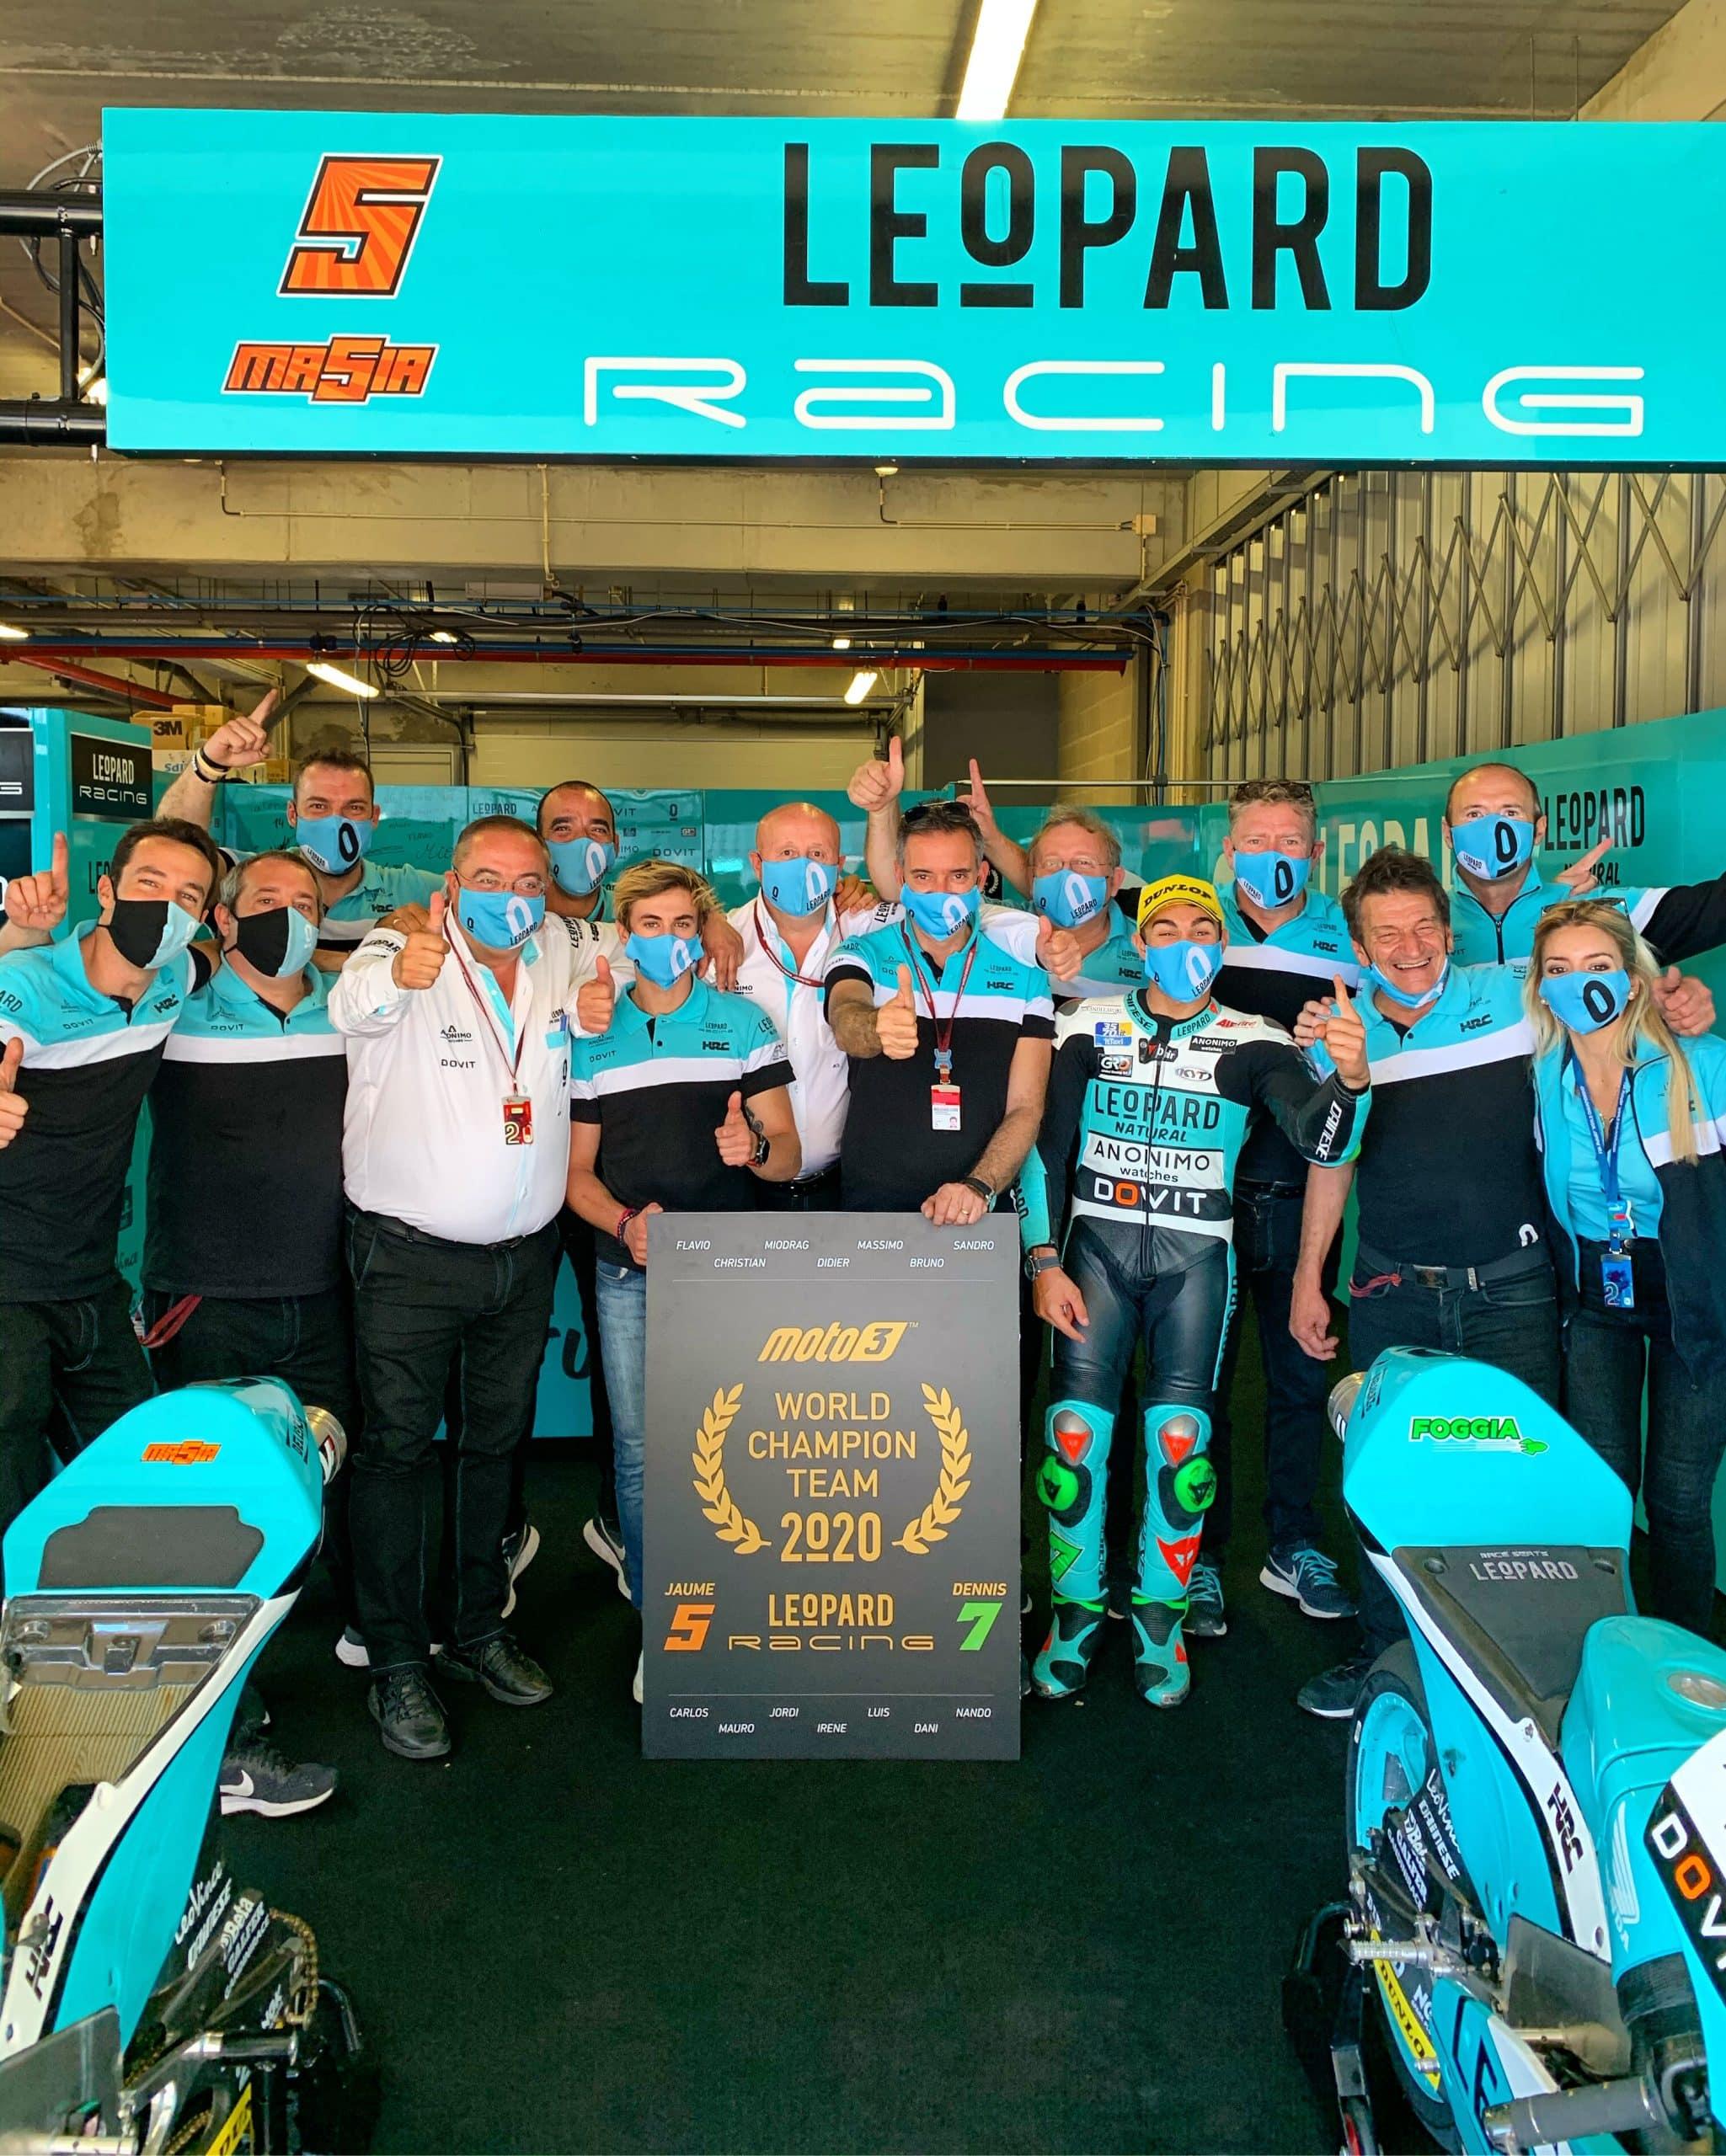 team leopard 2020